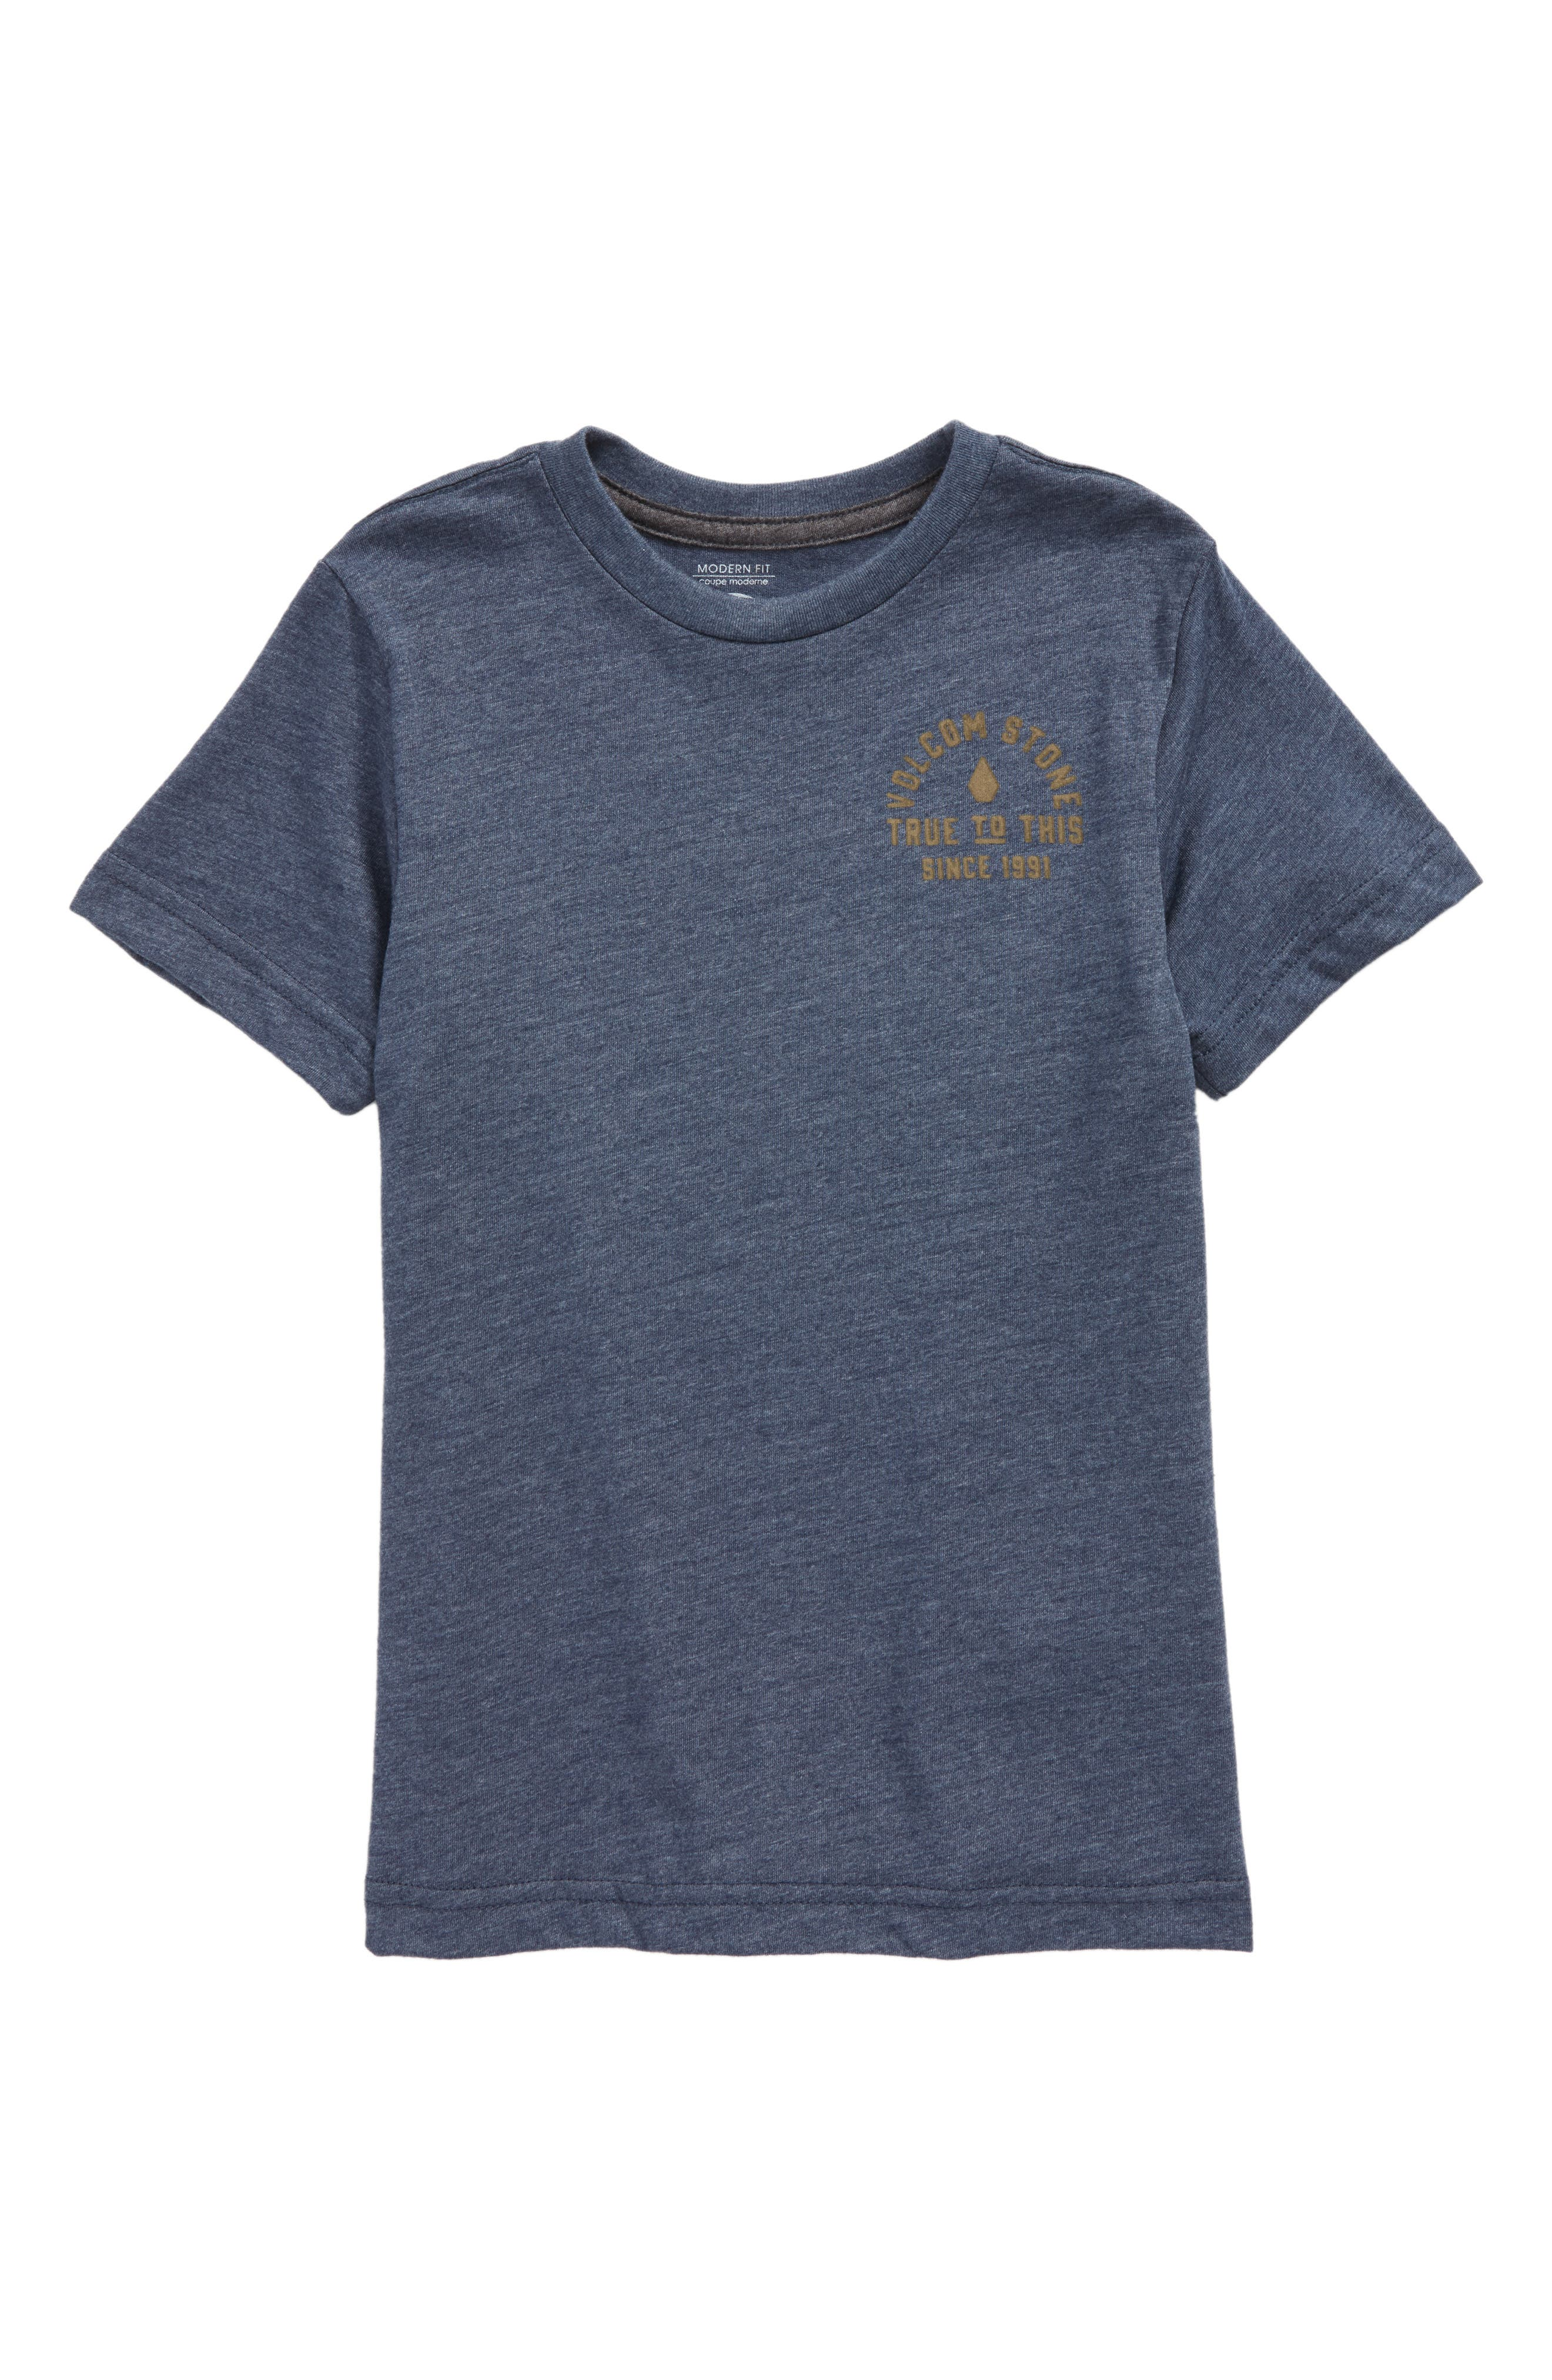 Stone Co. T-Shirt,                             Main thumbnail 1, color,                             Indigo